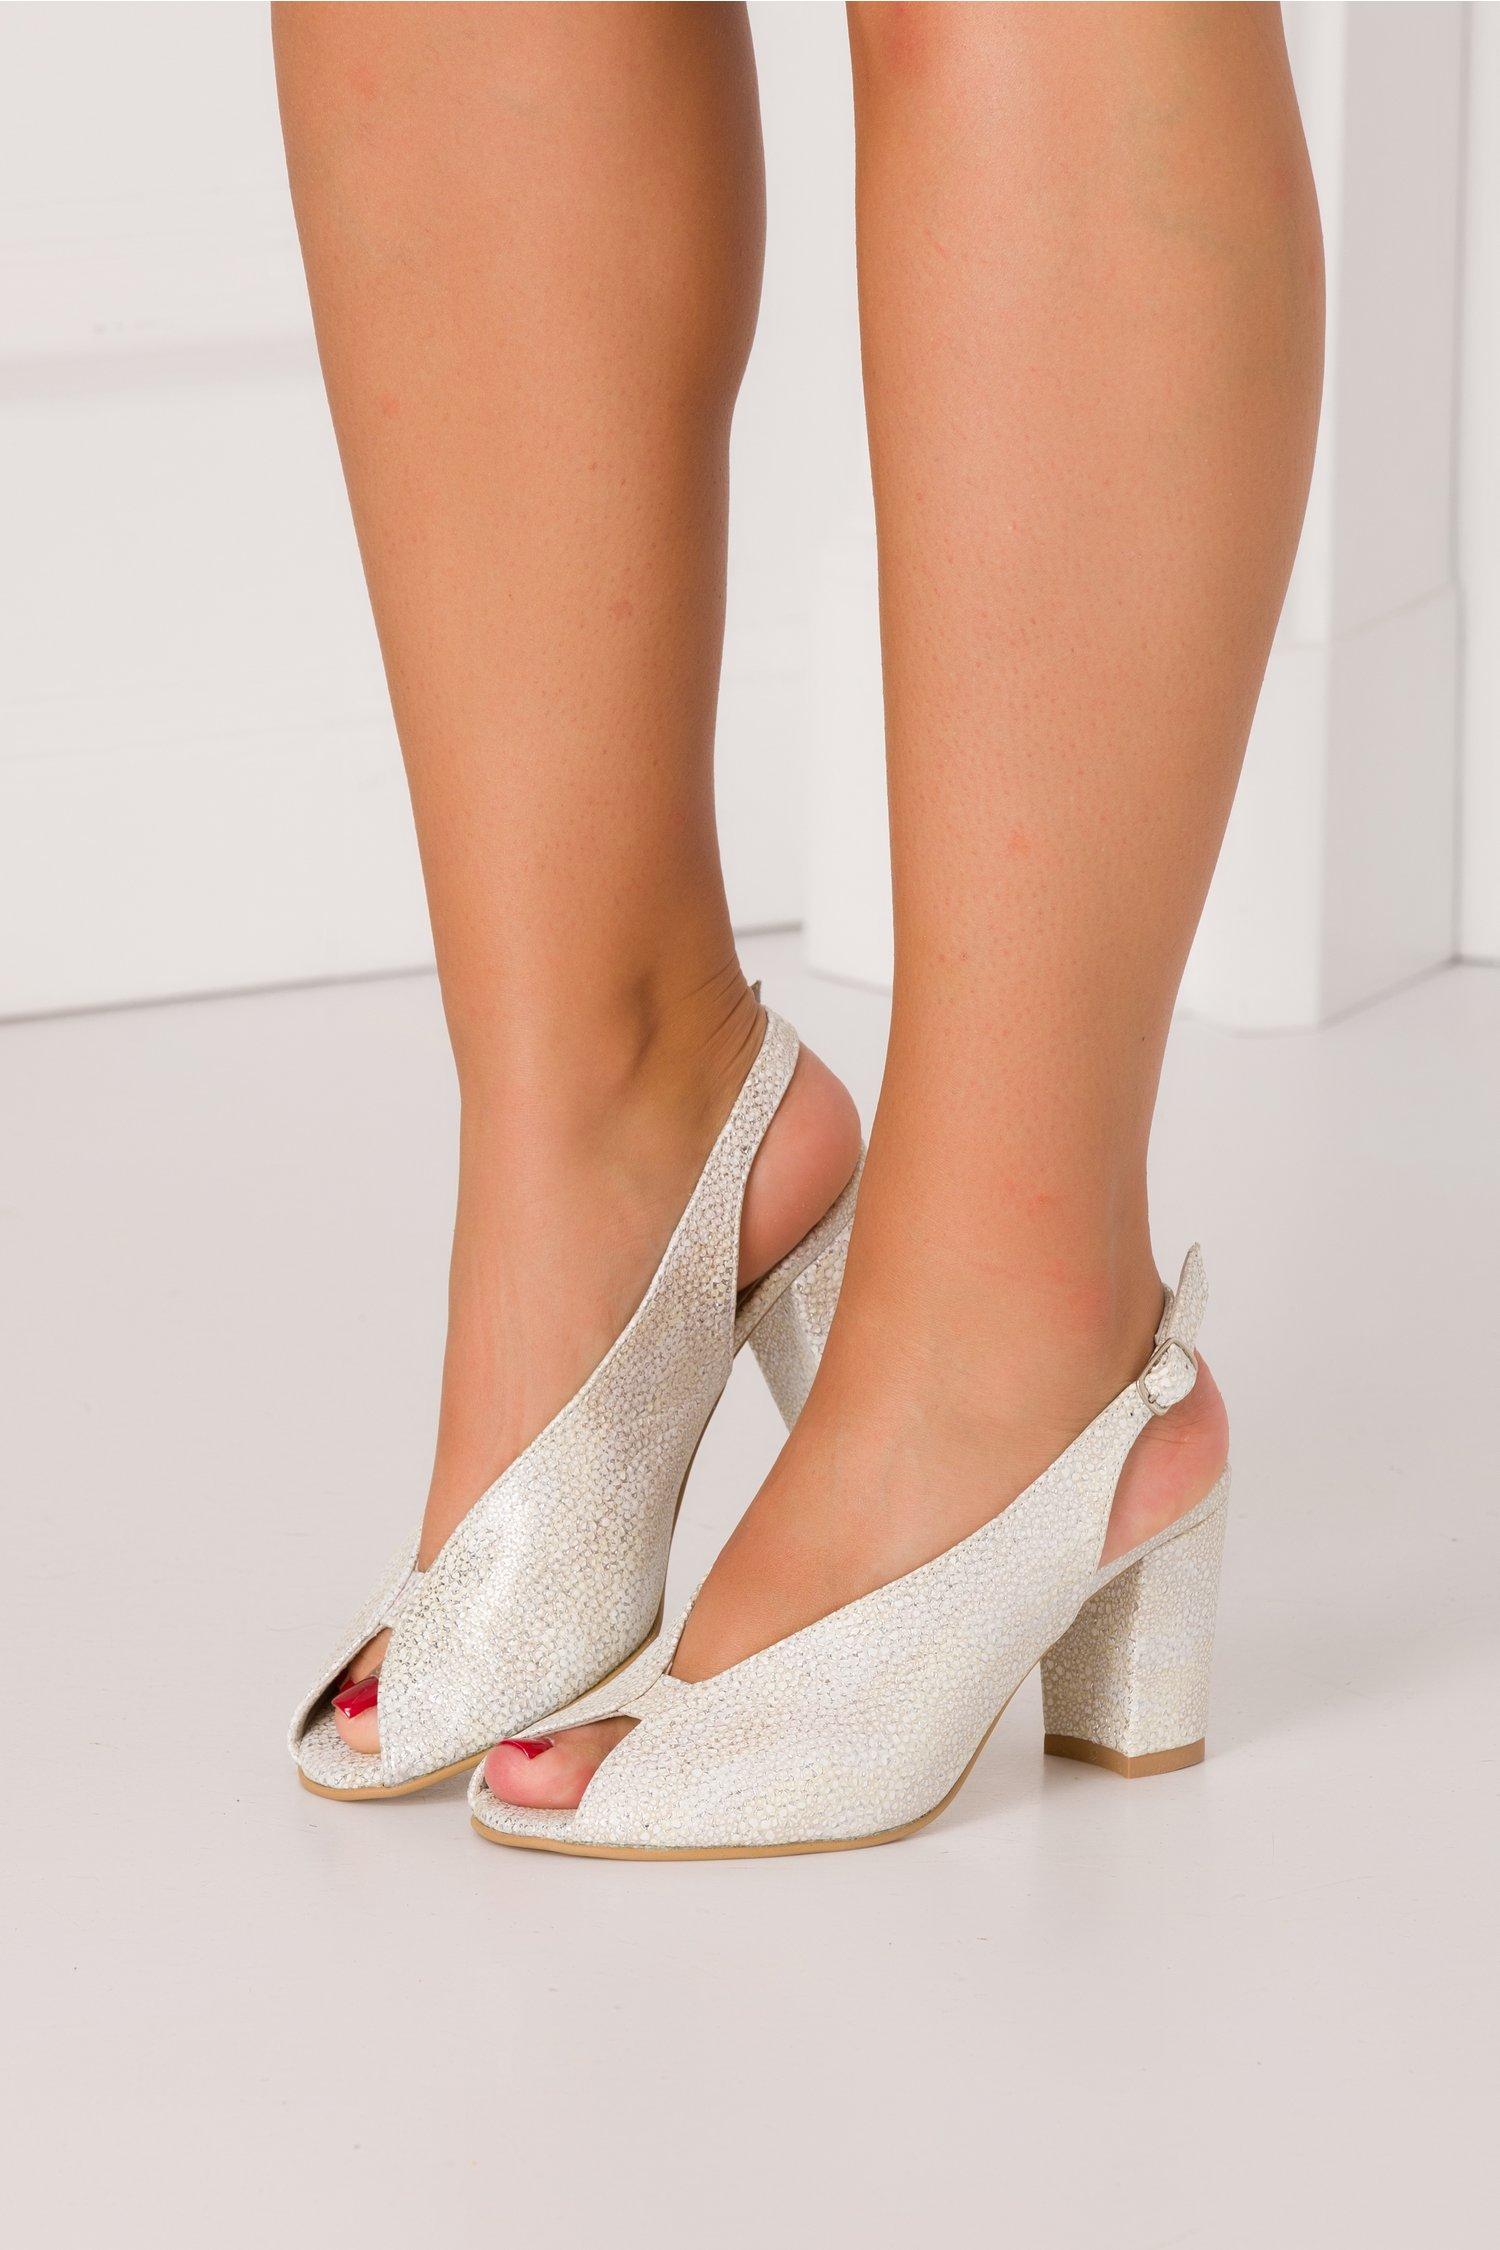 Sandale cu detalii argintii si imprimeu alb